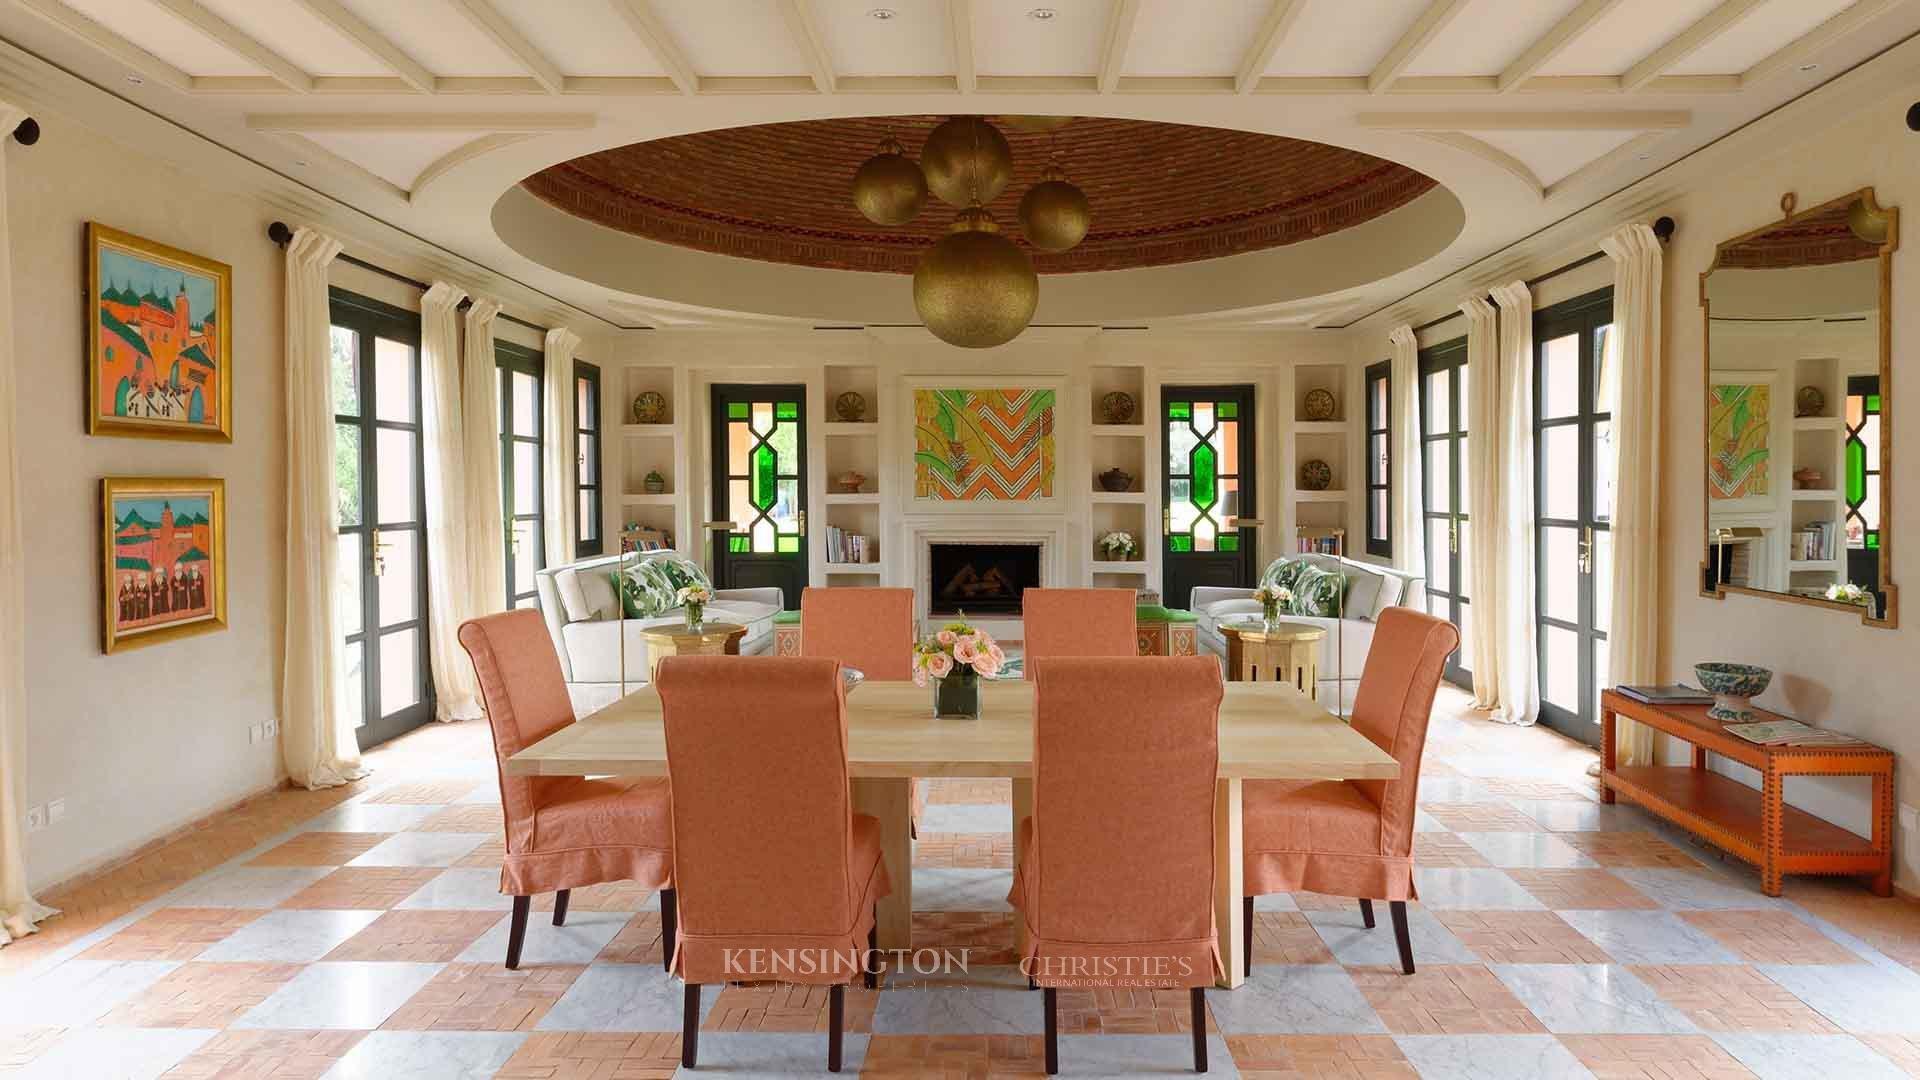 KPPM01009: Villa Azzay Luxury Villa Marrakech Morocco